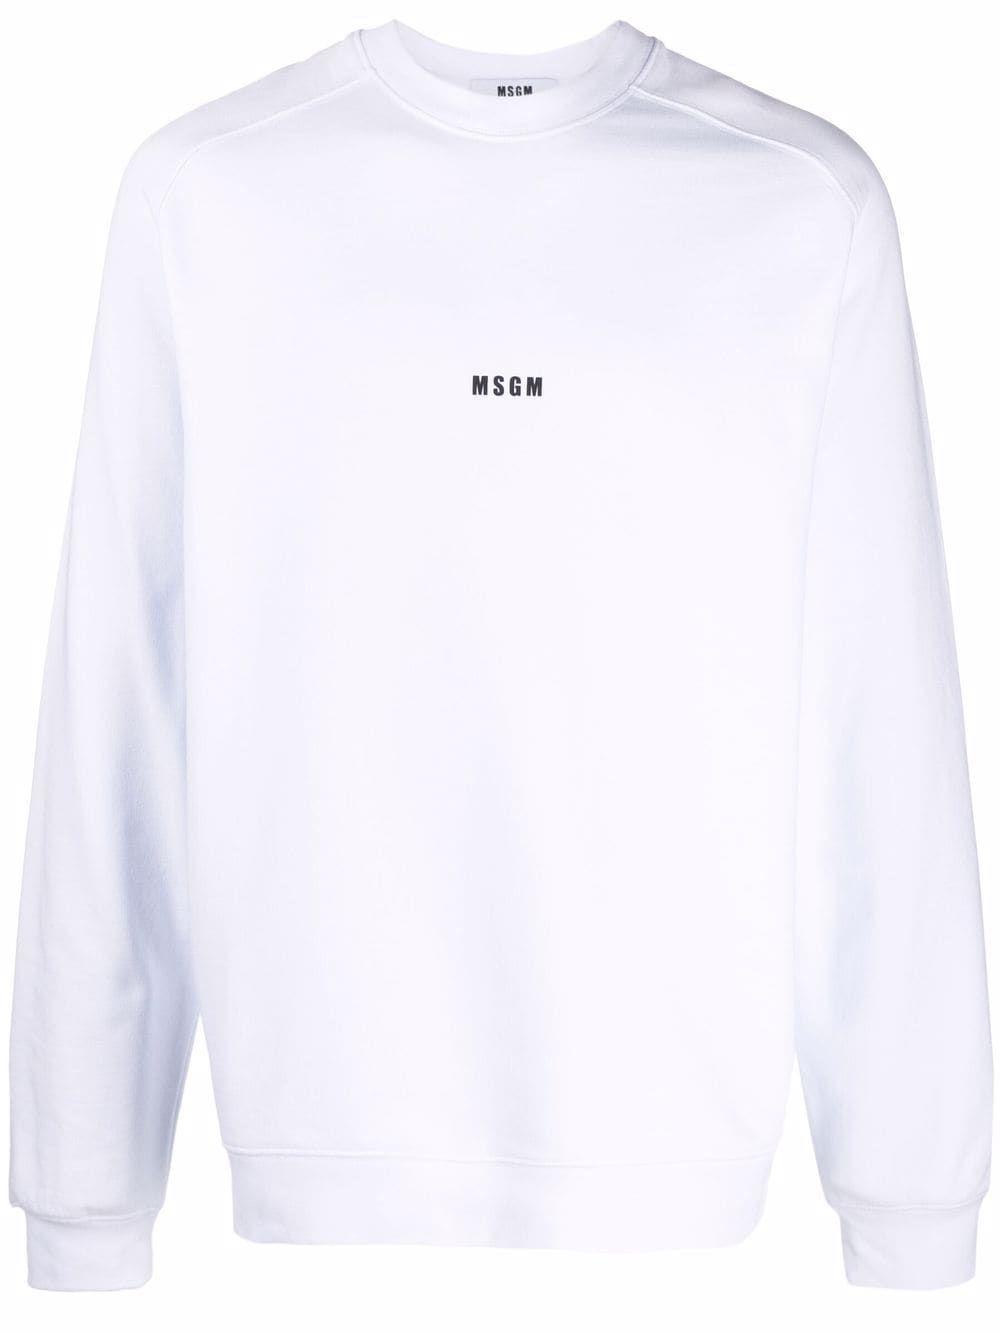 Msgm maglie bianco